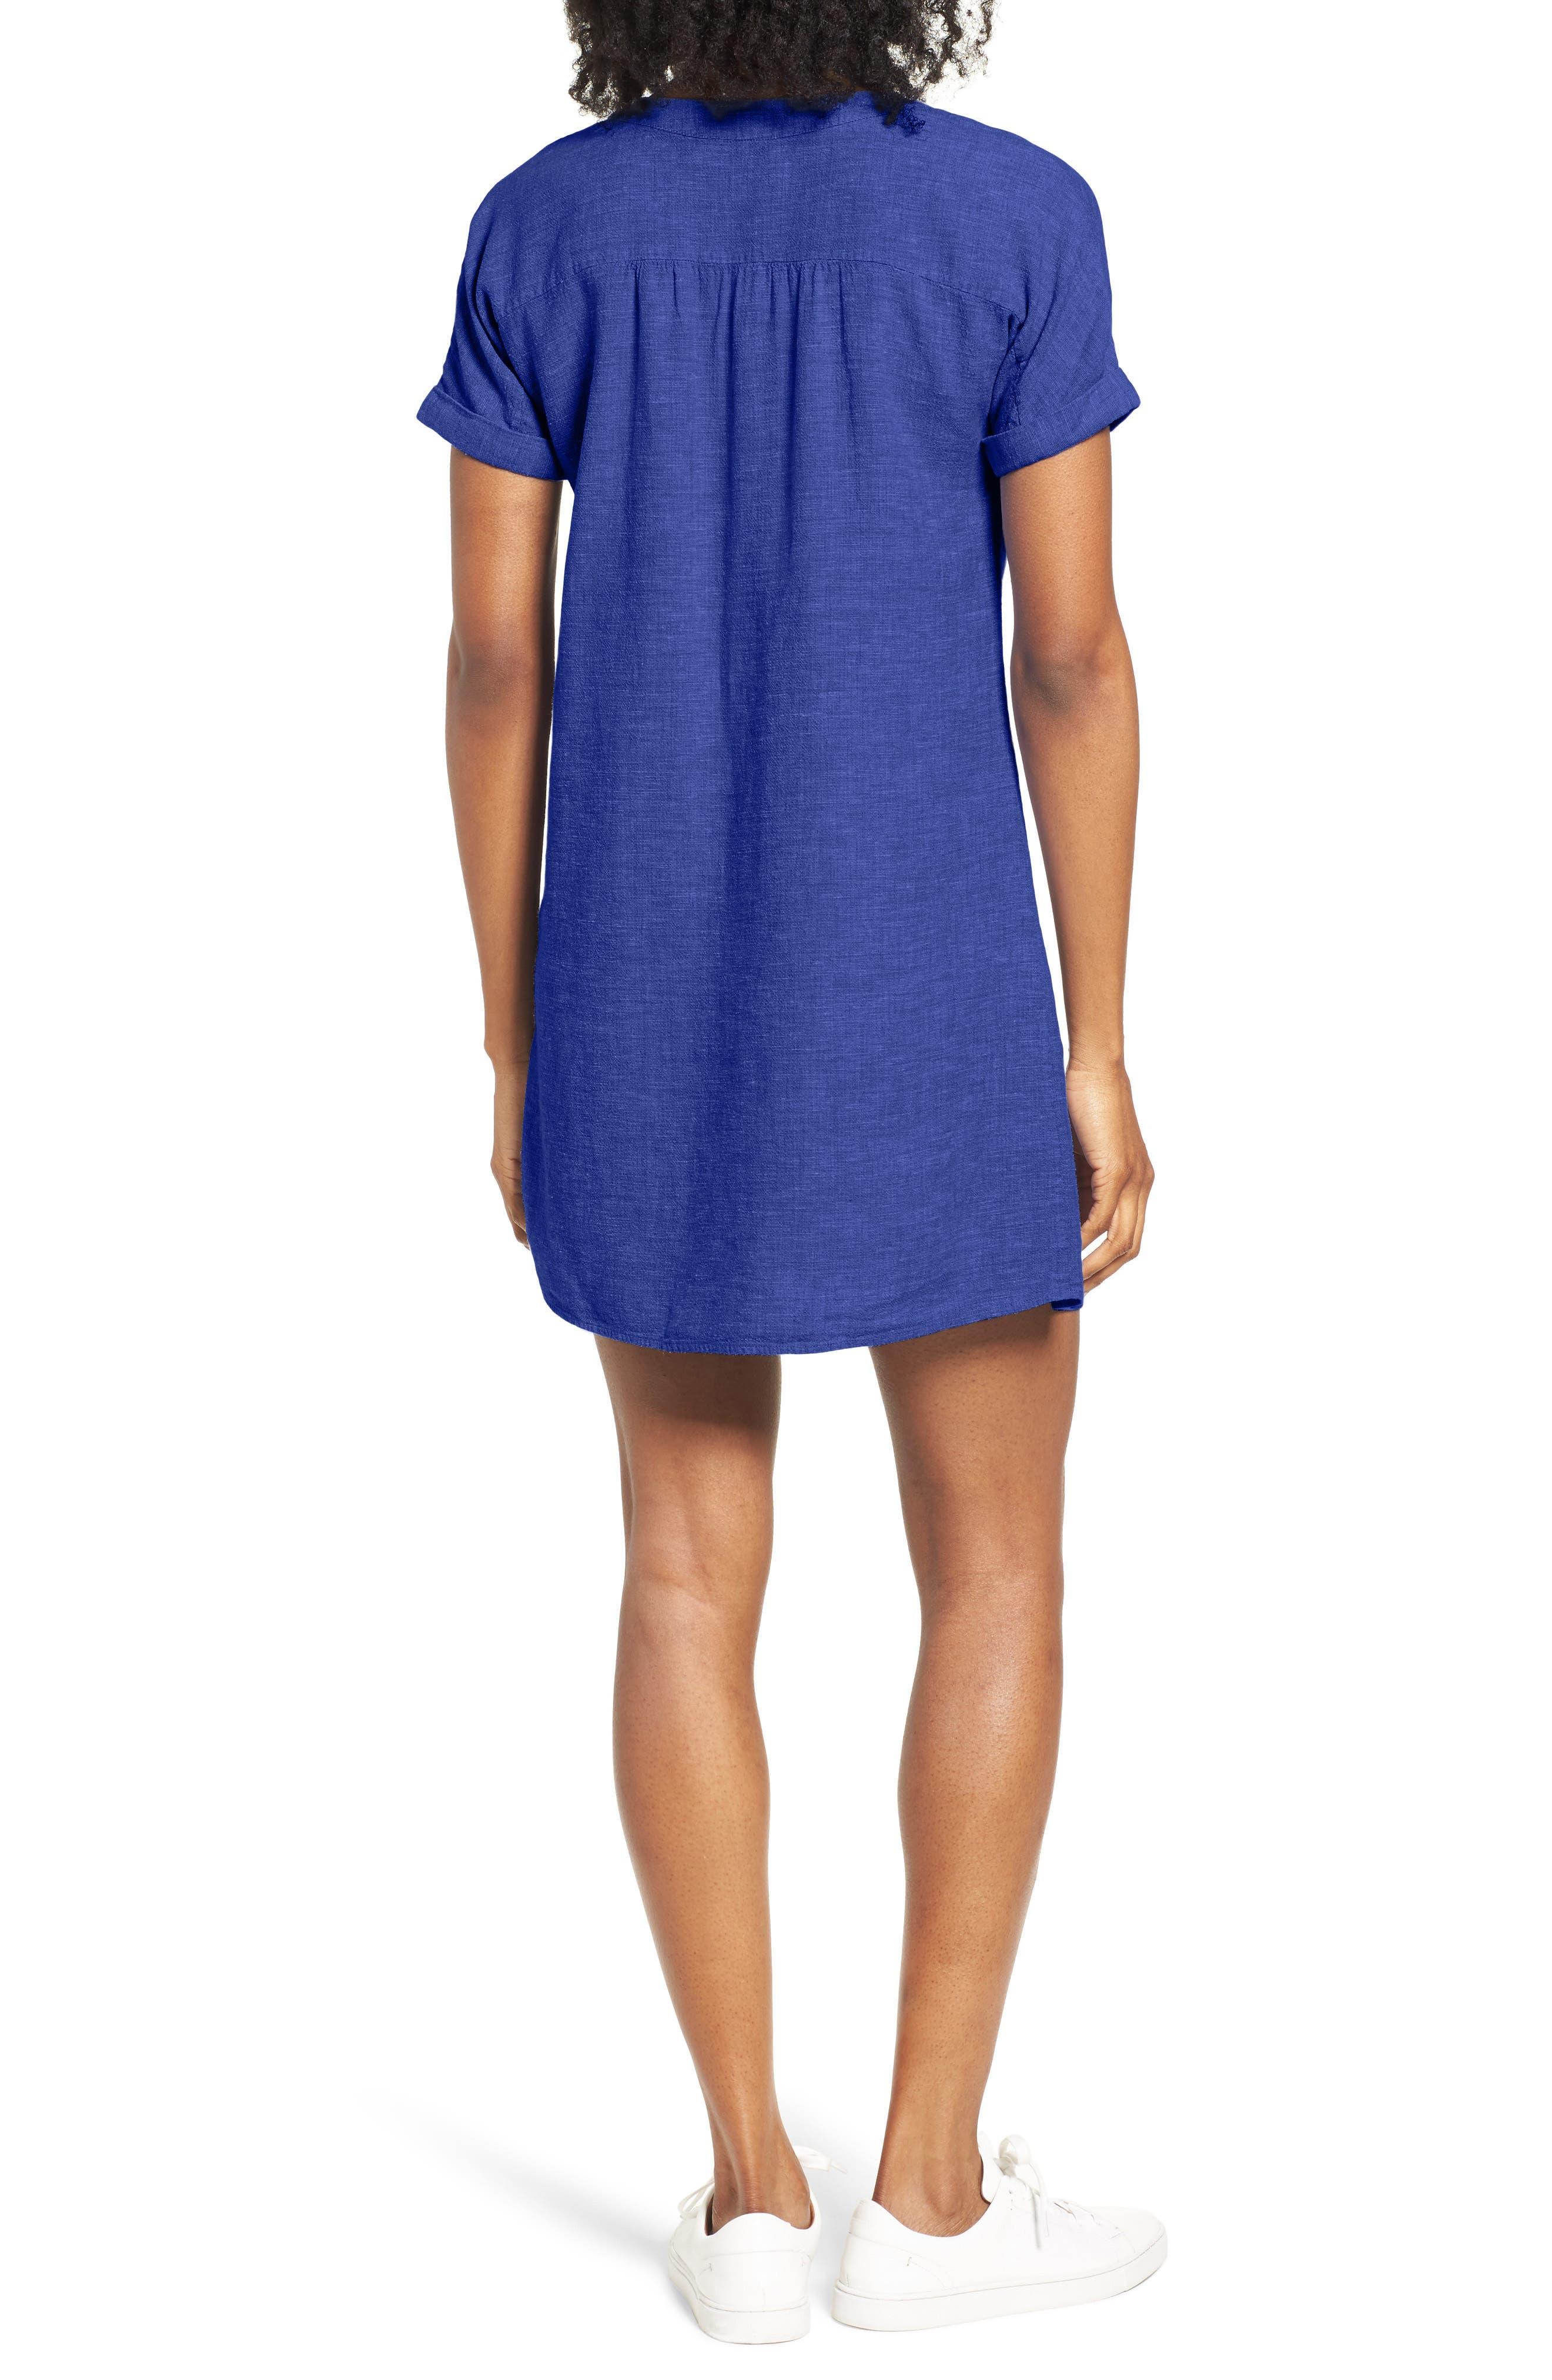 Alternate Image 2  - Vineyard Vines Linen Blend Shirtdress